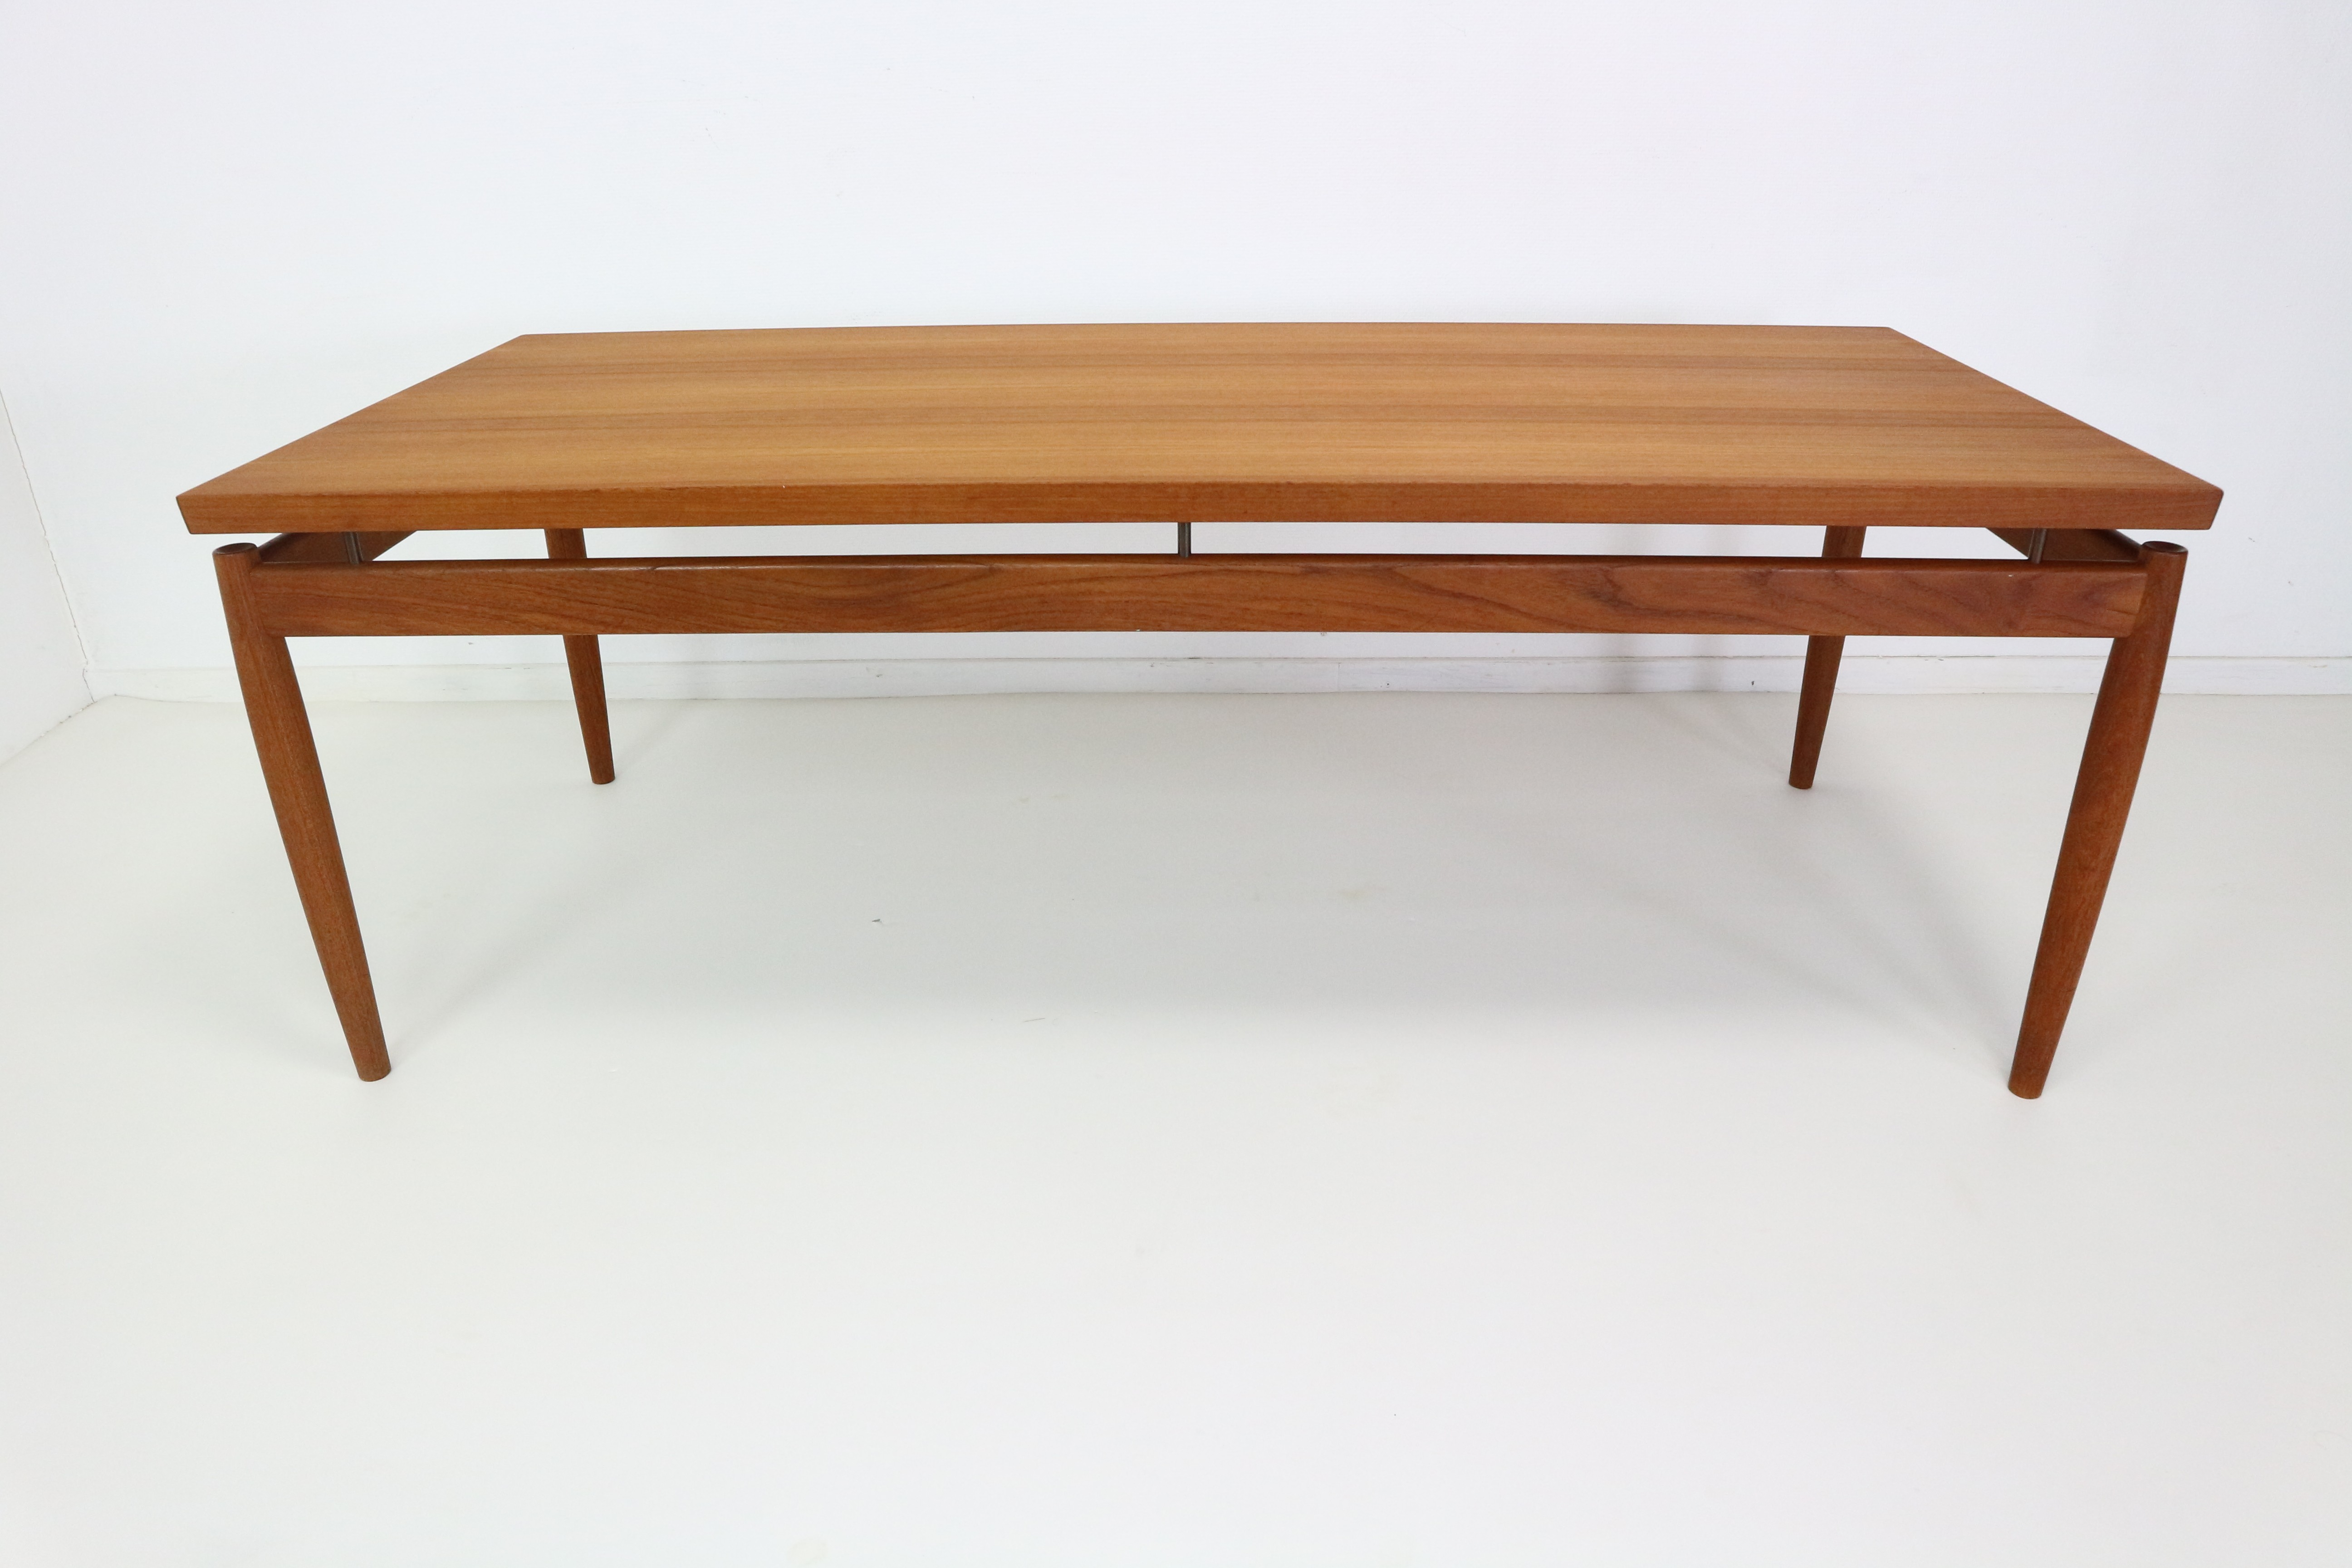 France & Son Coffee Table in Teak Grete Jalk 1960s Design Market